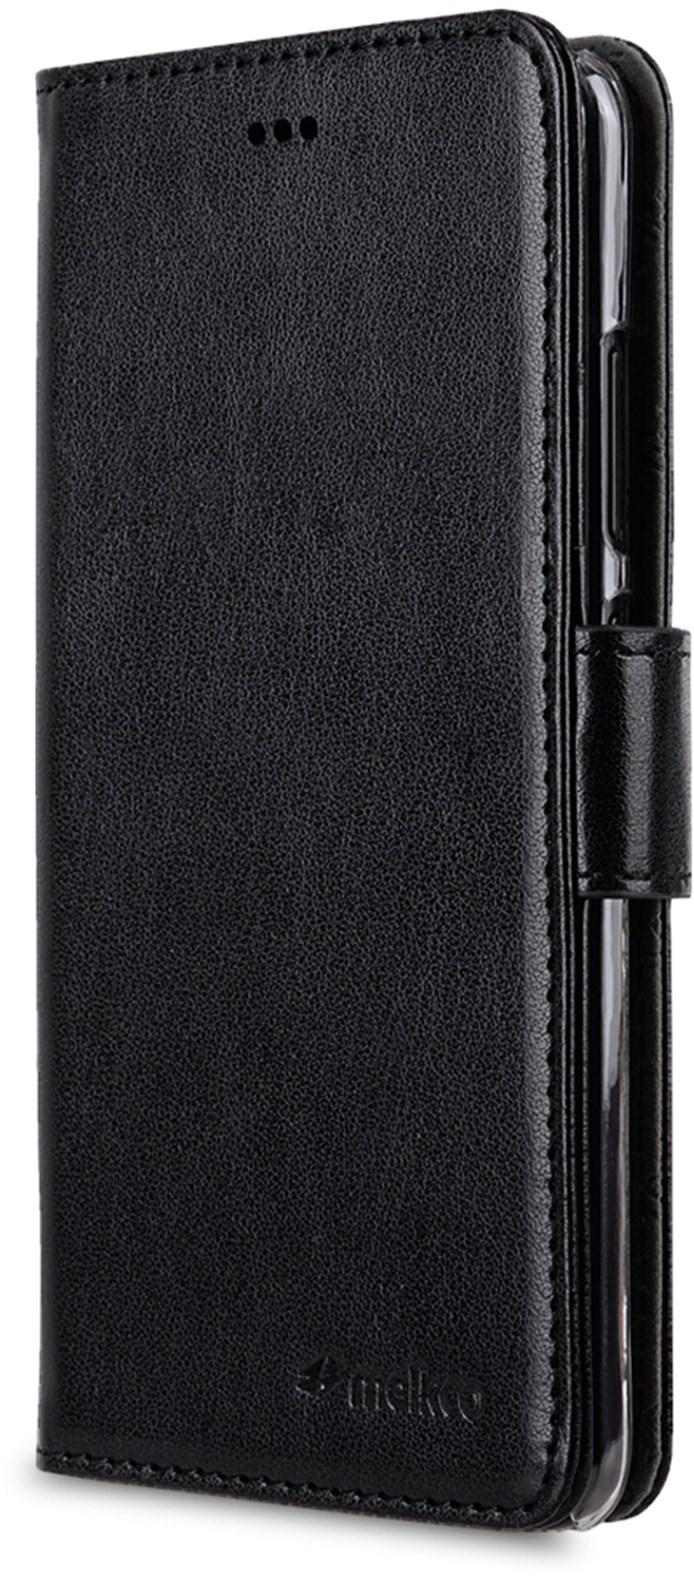 Melkco Walletcase Huawei P20 Pro Black